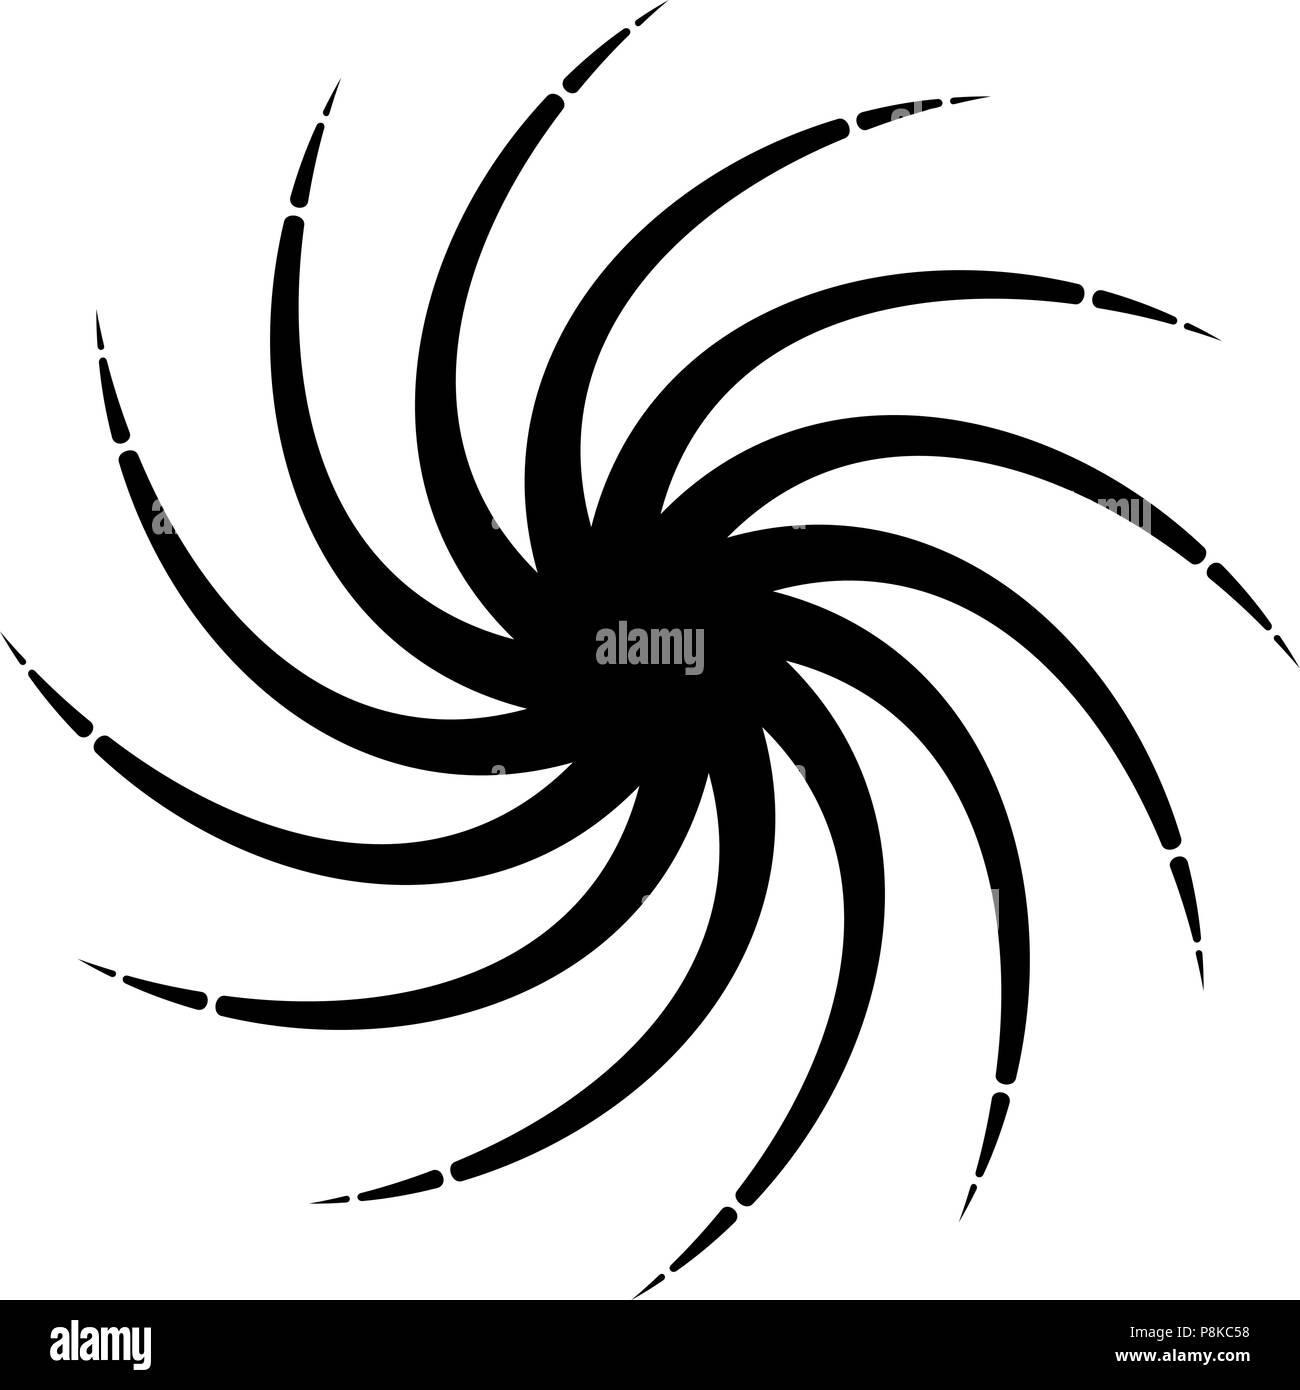 Vector Radial Spiral Black And White Background Illustration